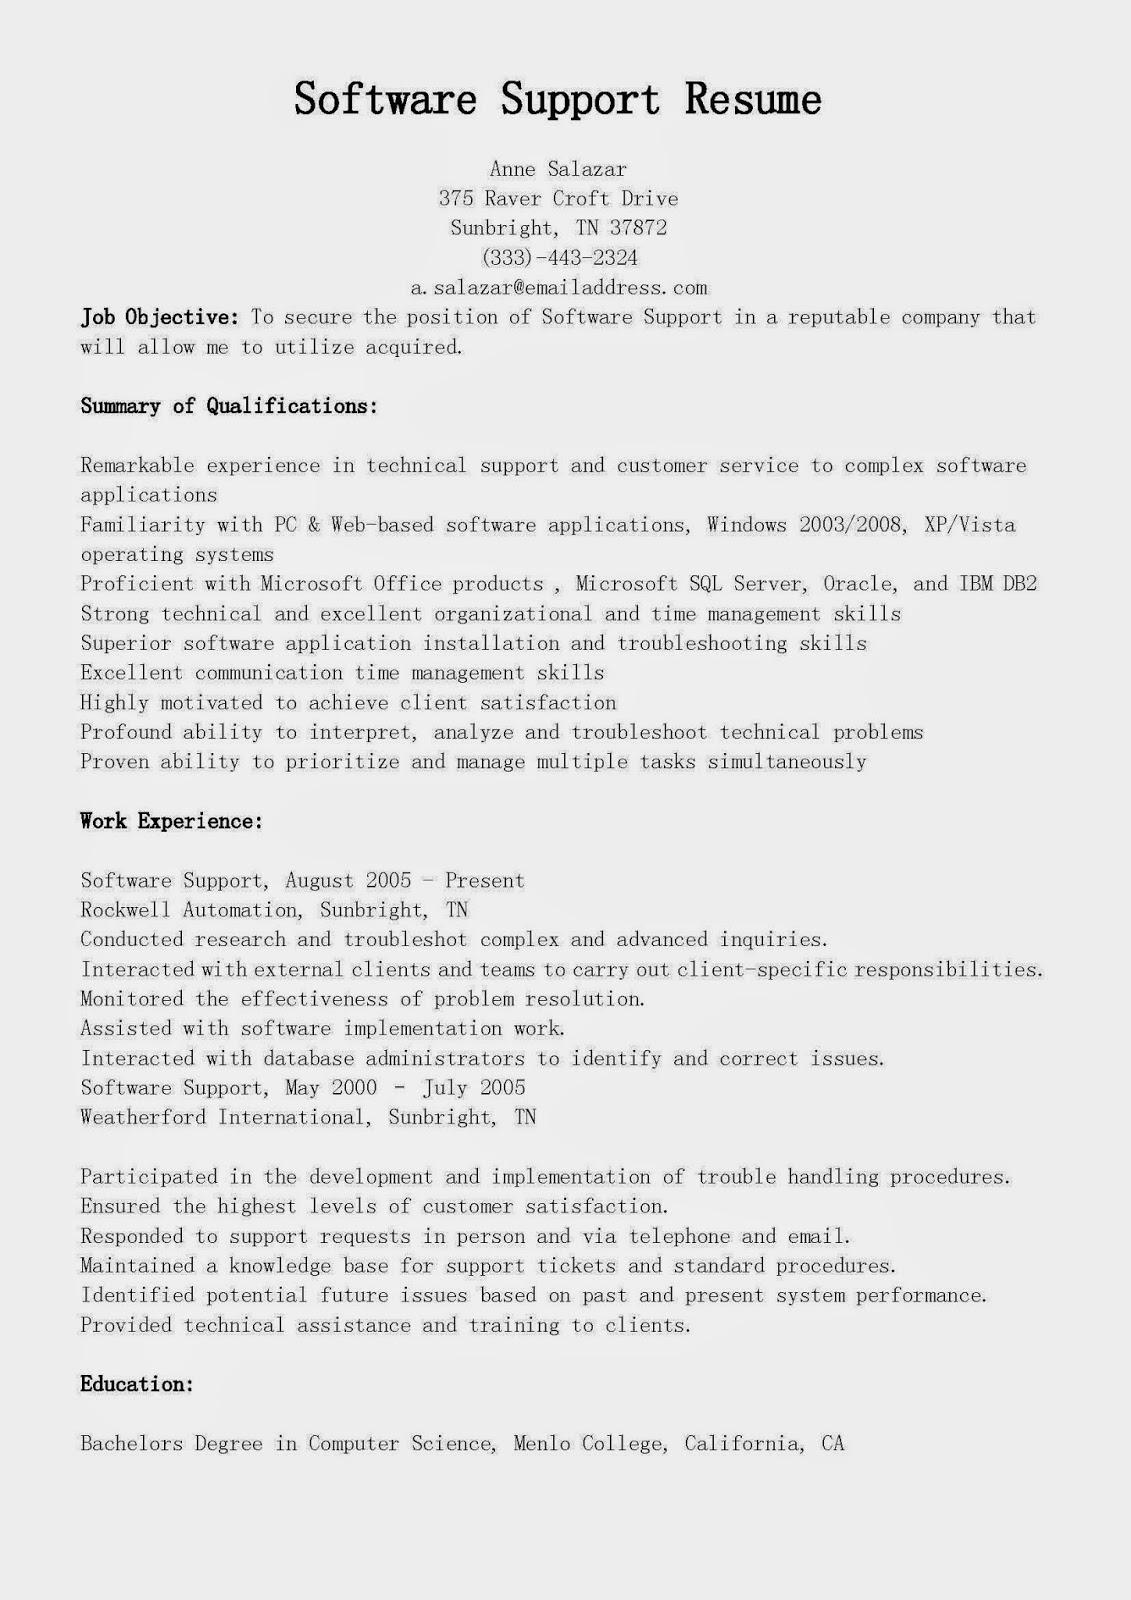 resume sles software support resume sle